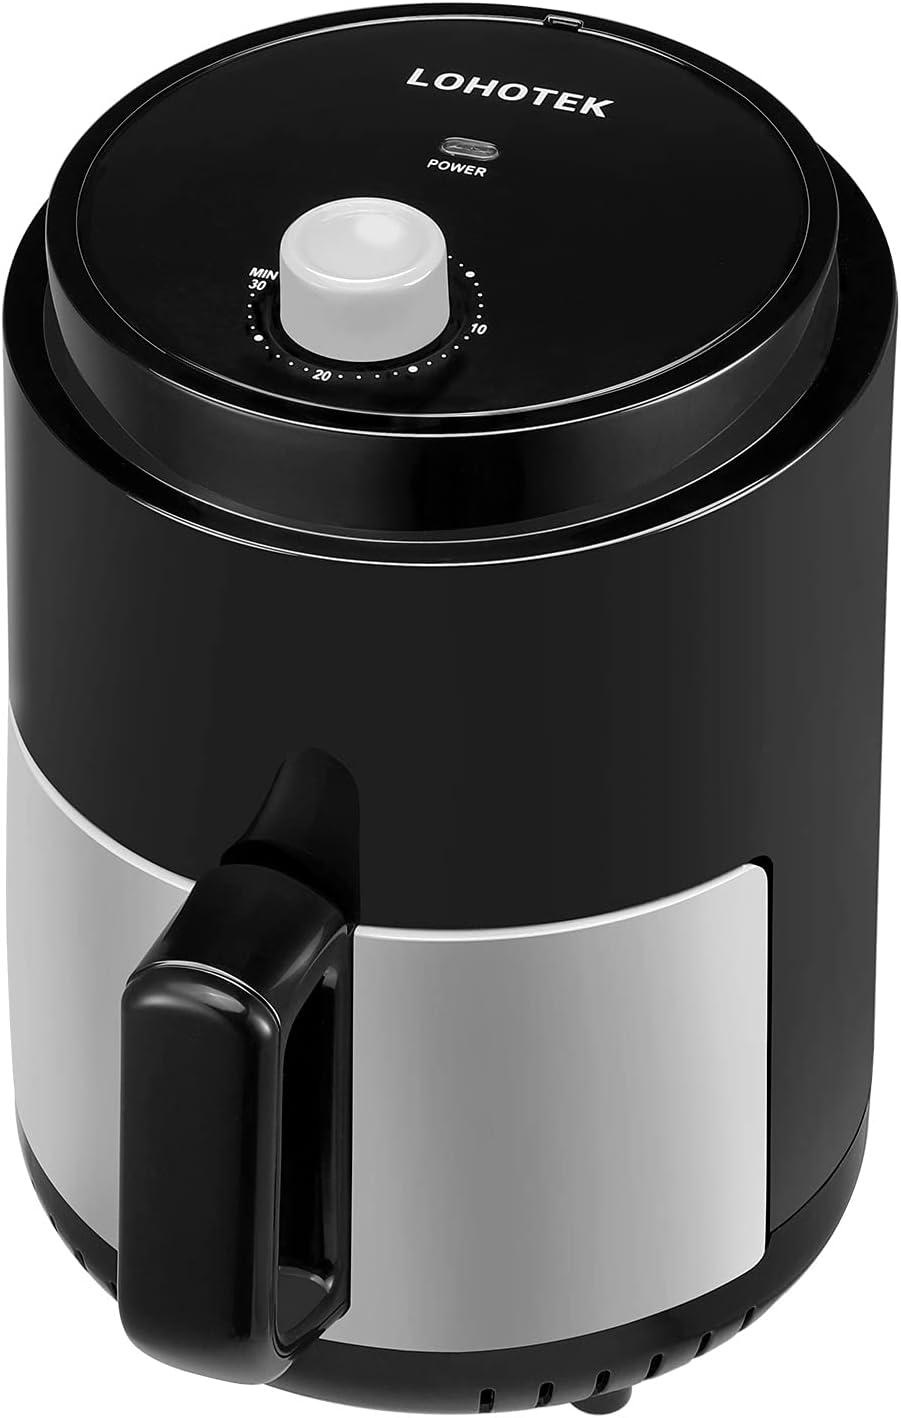 Freidora sin Aceite 2,3L Freidora de Aire-Caliente-Airfryer - Con Temporizador0-30min Temperatura 200ºC Fácil de limpiar Fácil de usar Adecuado para 1-3 personas (1100W)